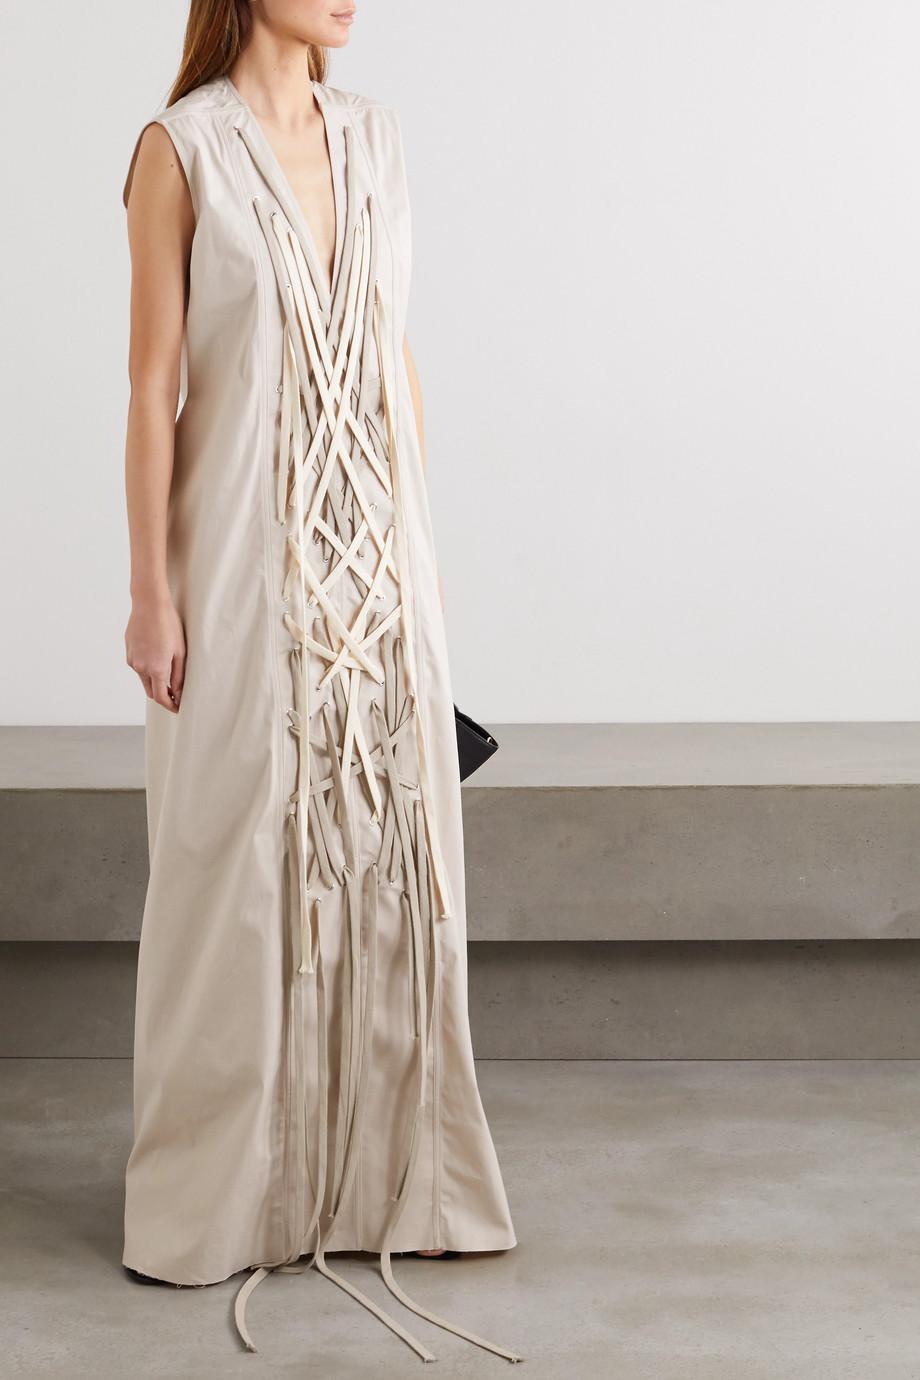 Rick Owens Abito lace-up cotton-blend gown